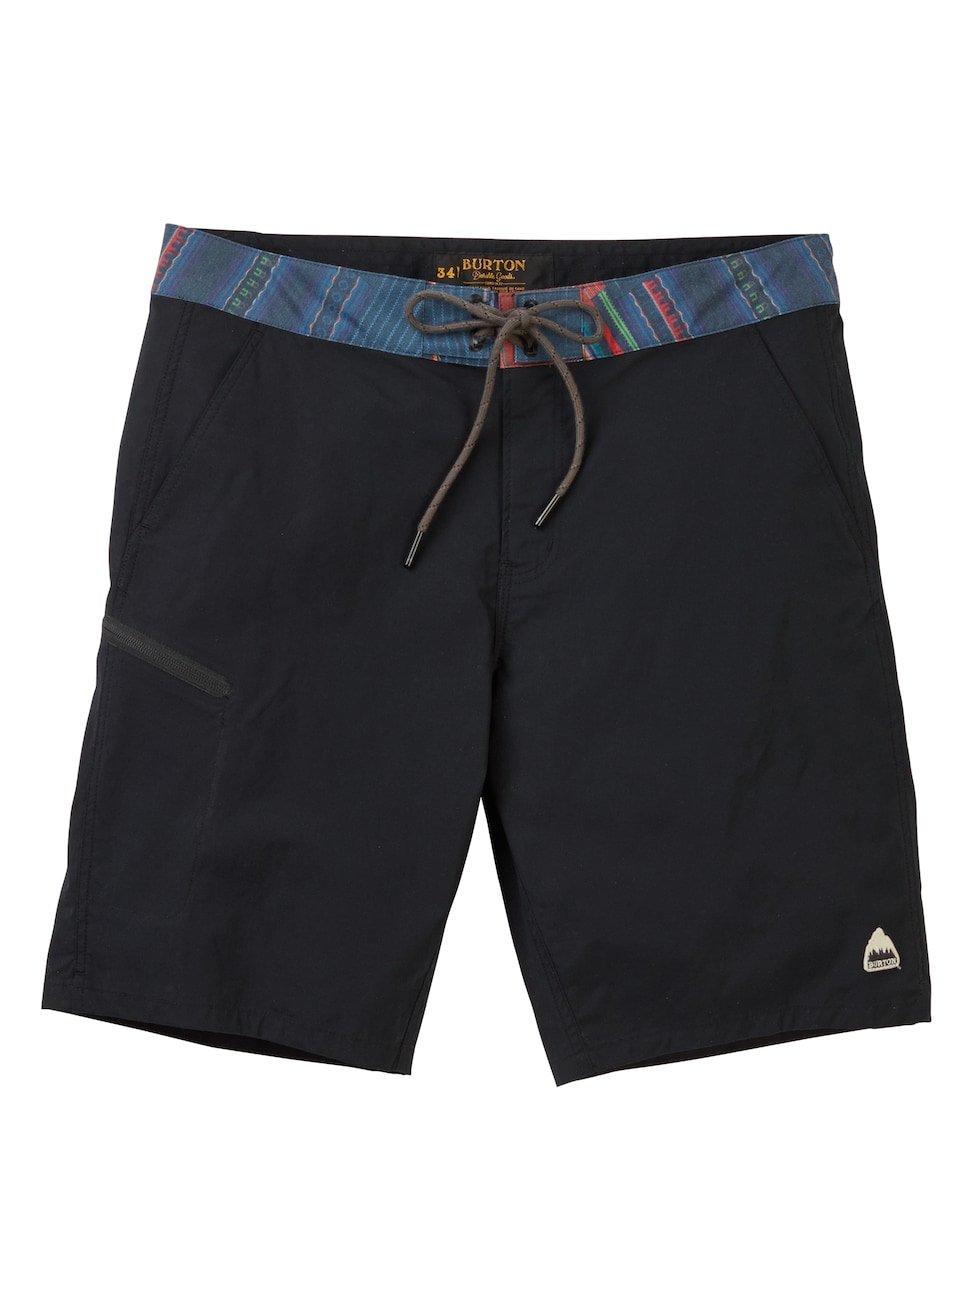 TALLA 32. Burton Moxie Short Pantalones Cortos, Hombre